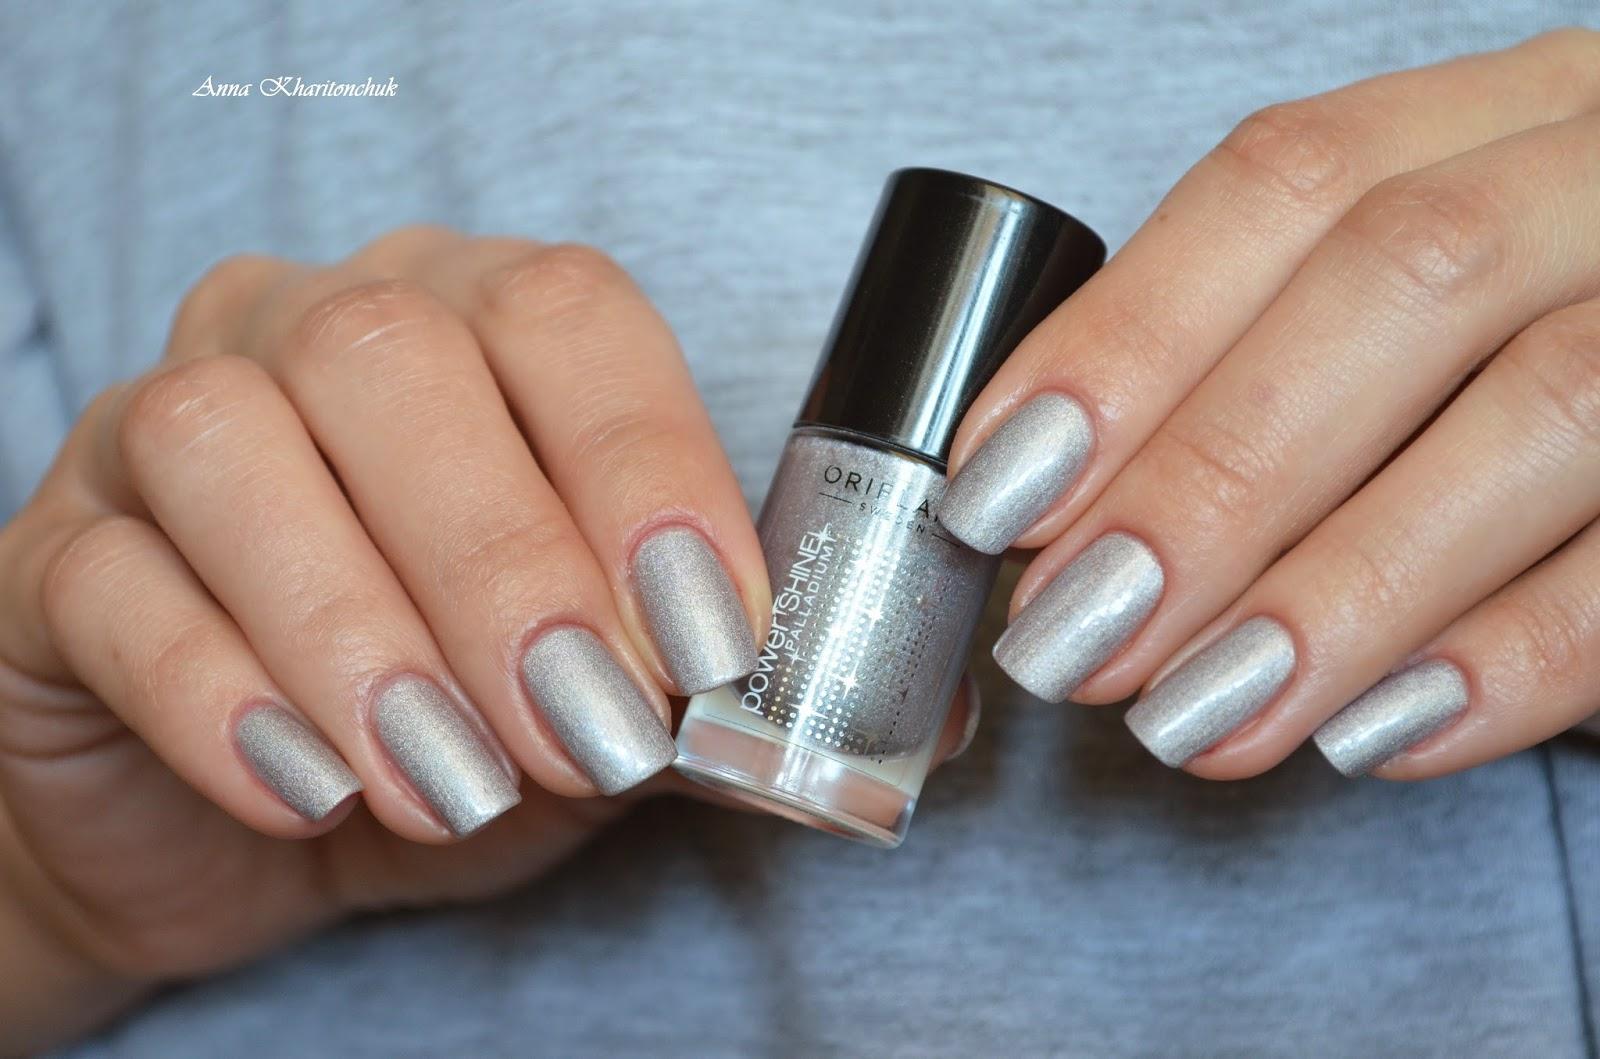 Oriflame Power Shine Palladium Reflecting Silver + стемпинг Lesly